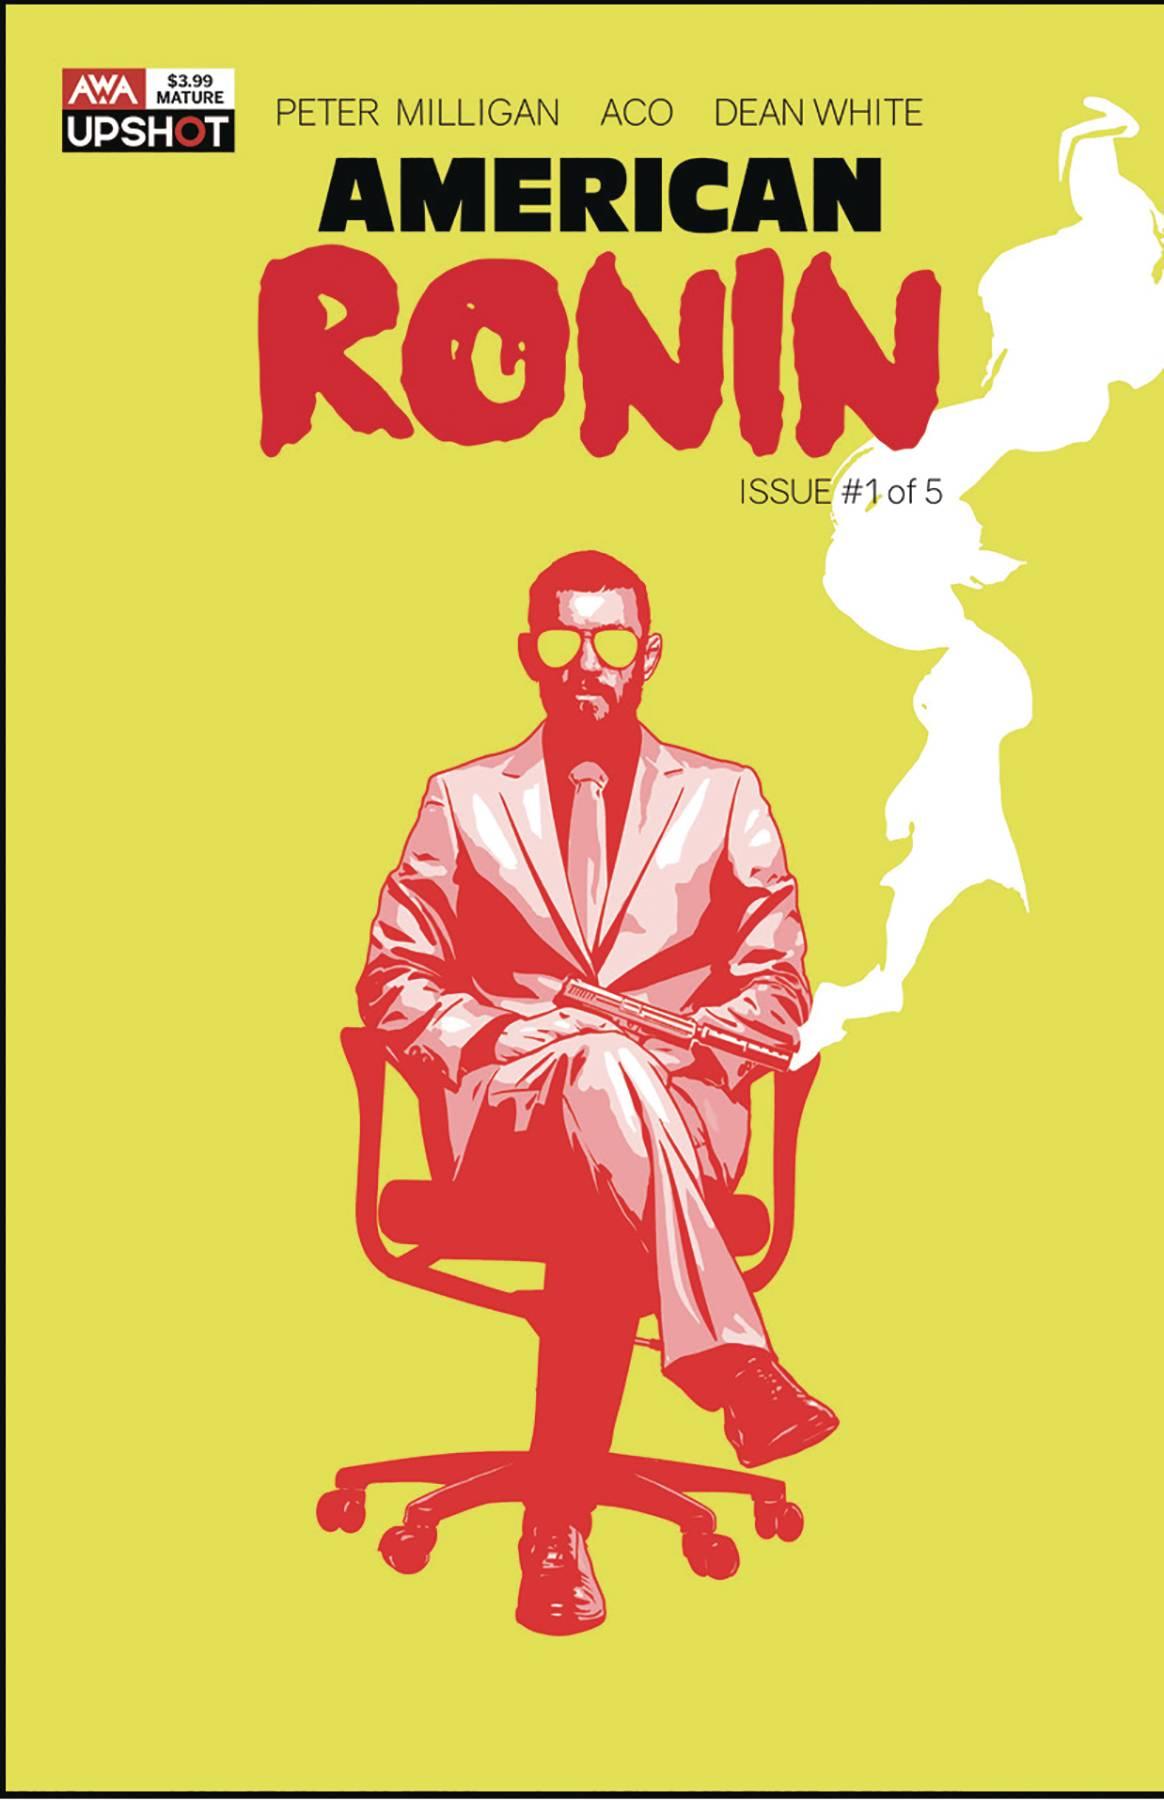 American Ronin #1 (2020)